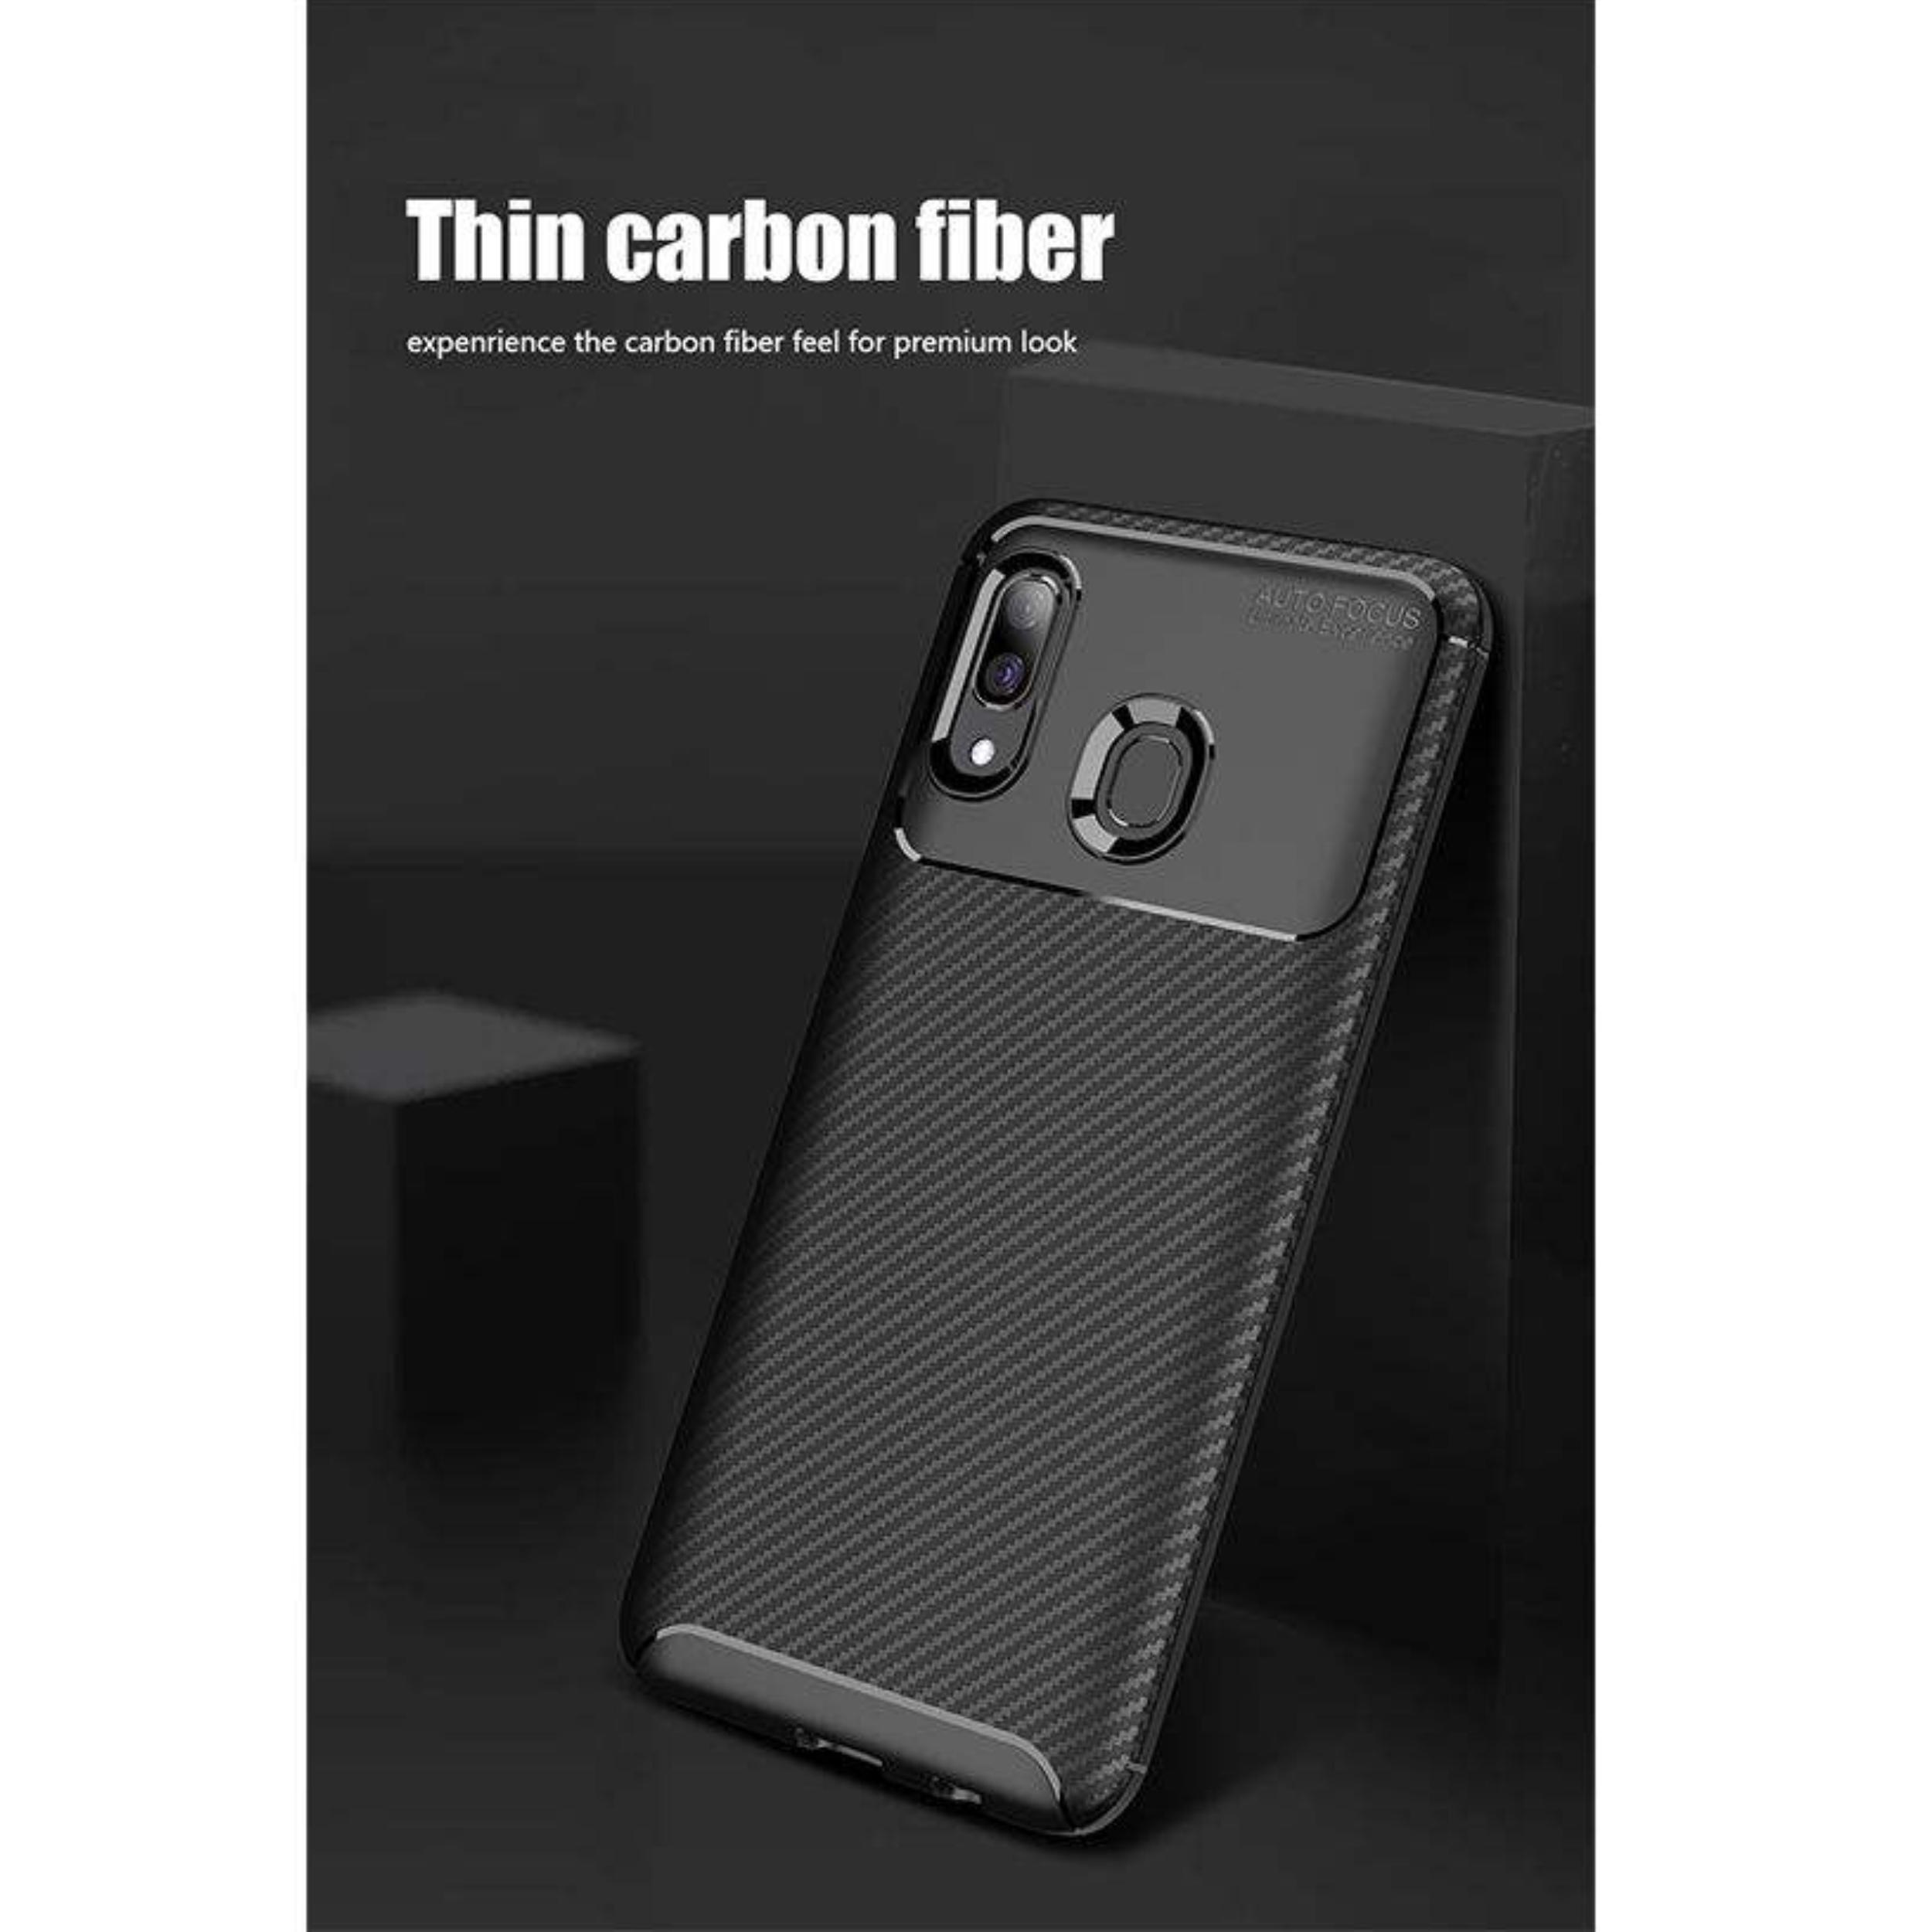 کاور لاین کینگ مدل A21 مناسب برای گوشی موبایل سامسونگ Galaxy A20/ A30/M10s thumb 2 3